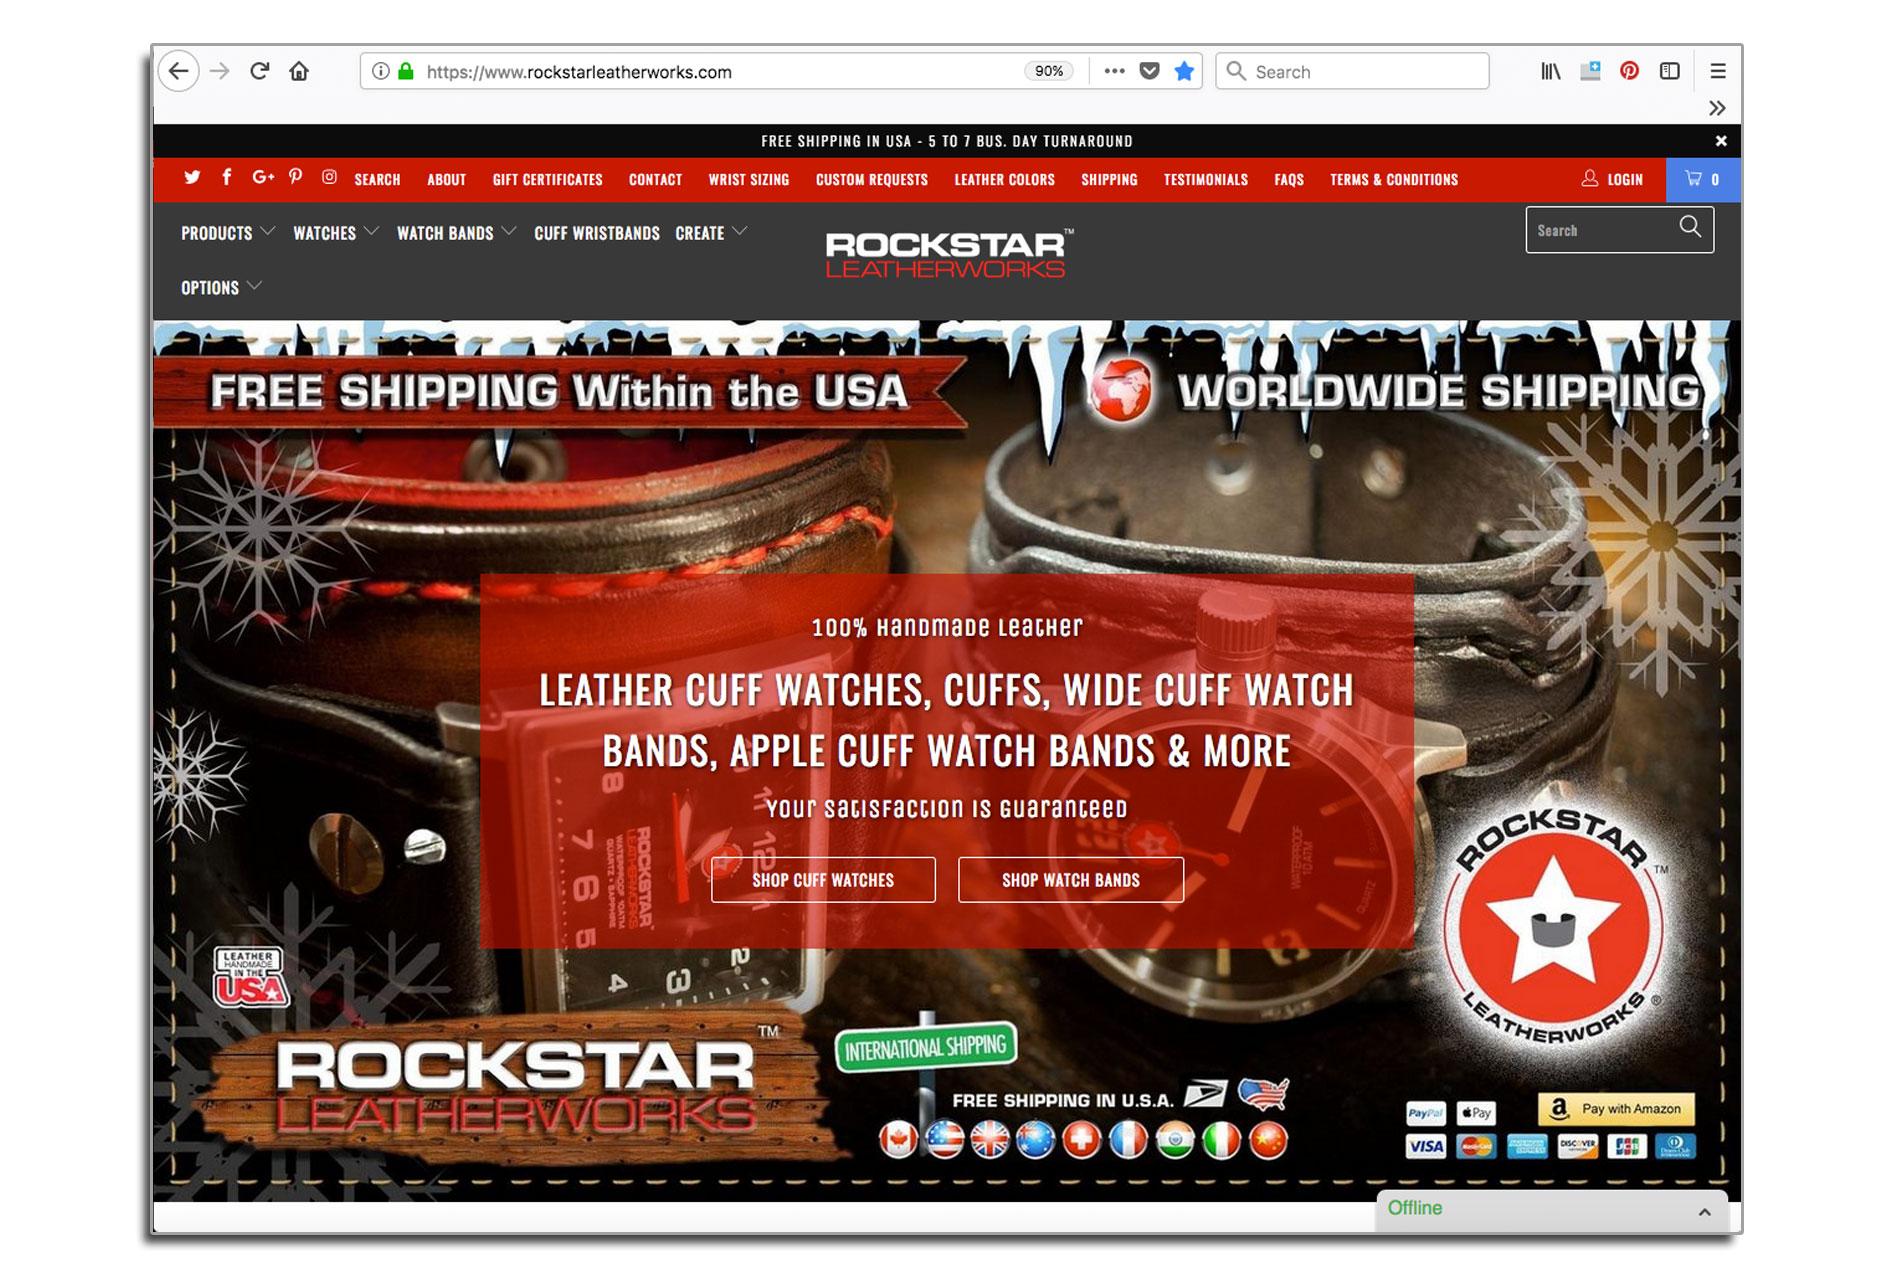 Rockstar Leatherworks